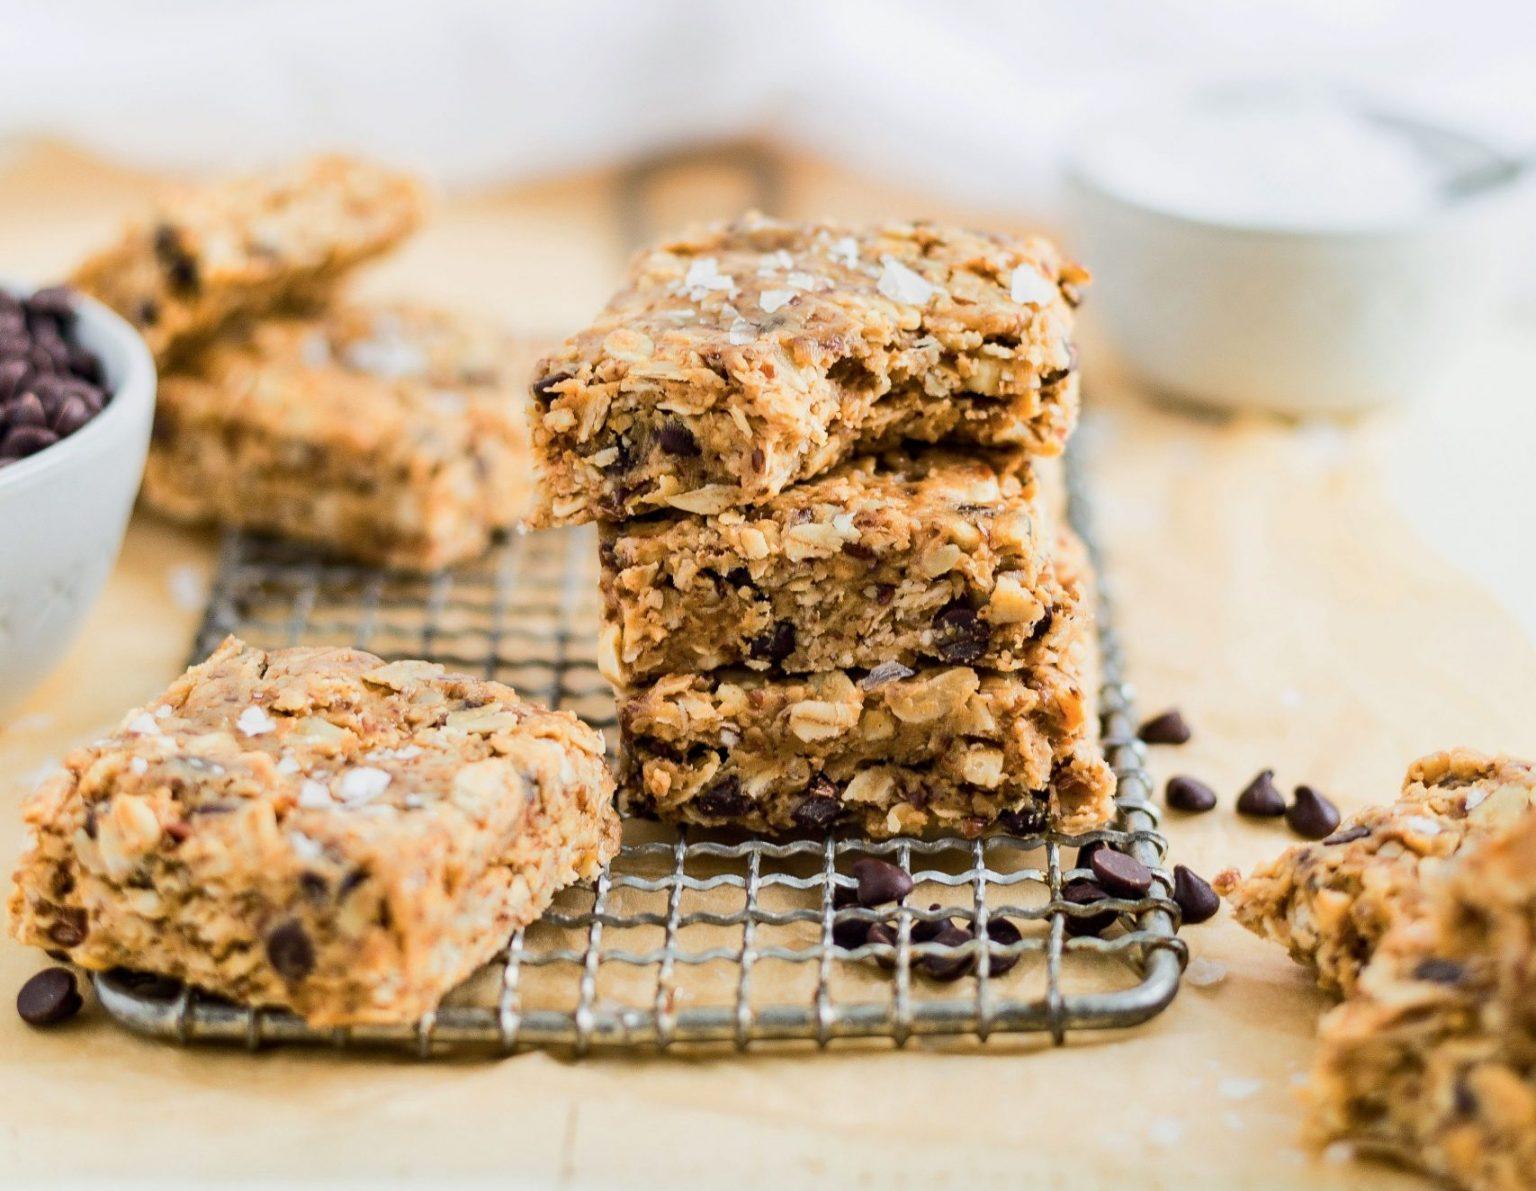 Vegan No-Bake Chocolate Peanut Butter Granola Bars